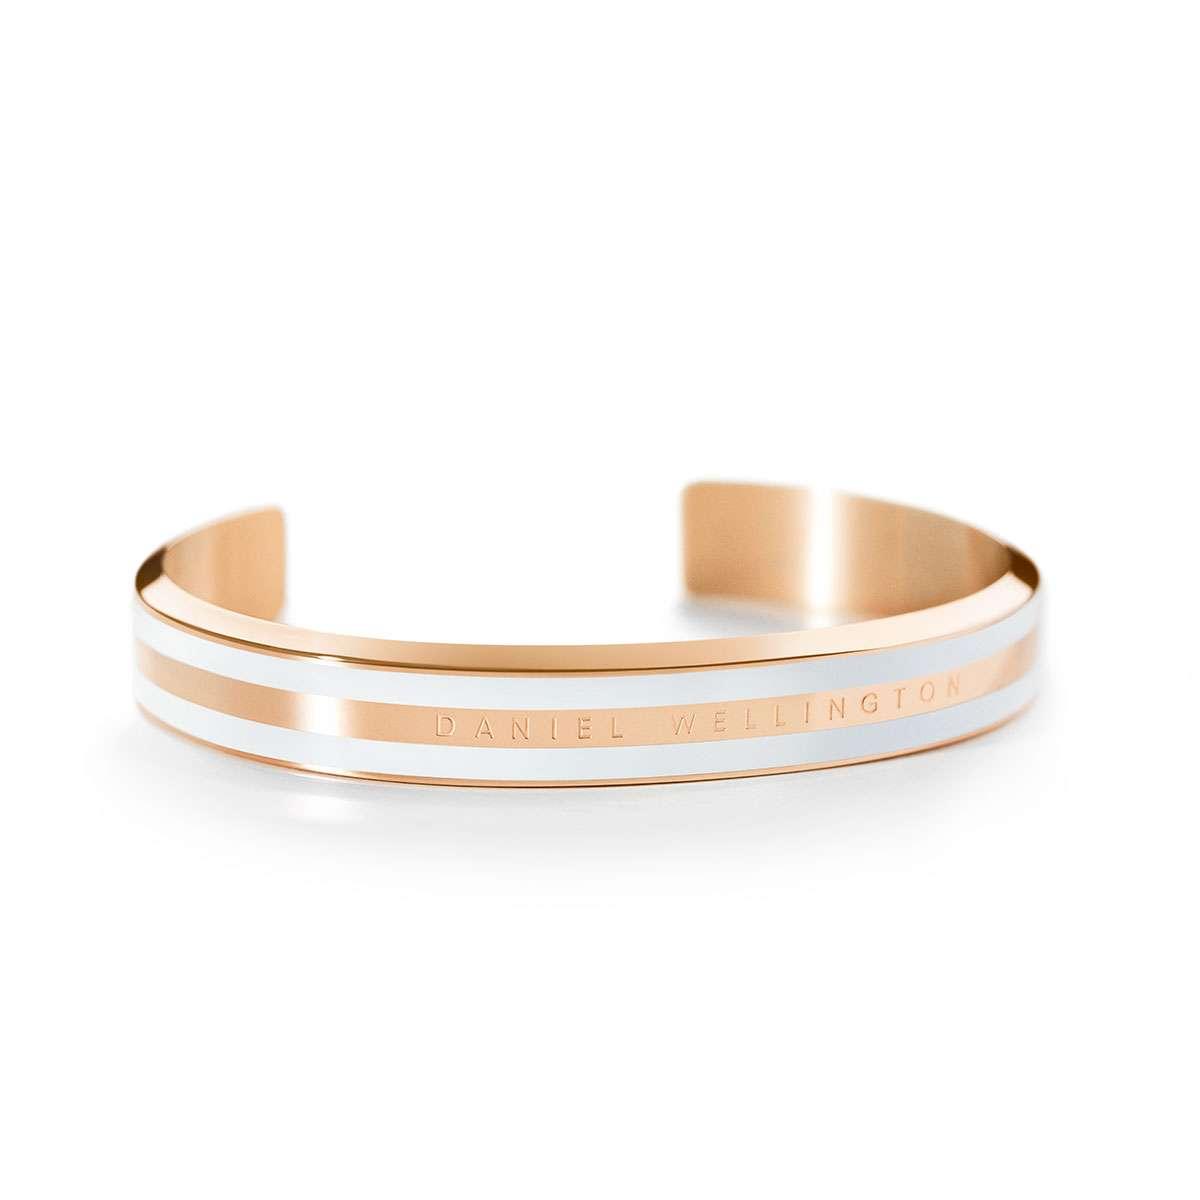 daniel wellington bracelet